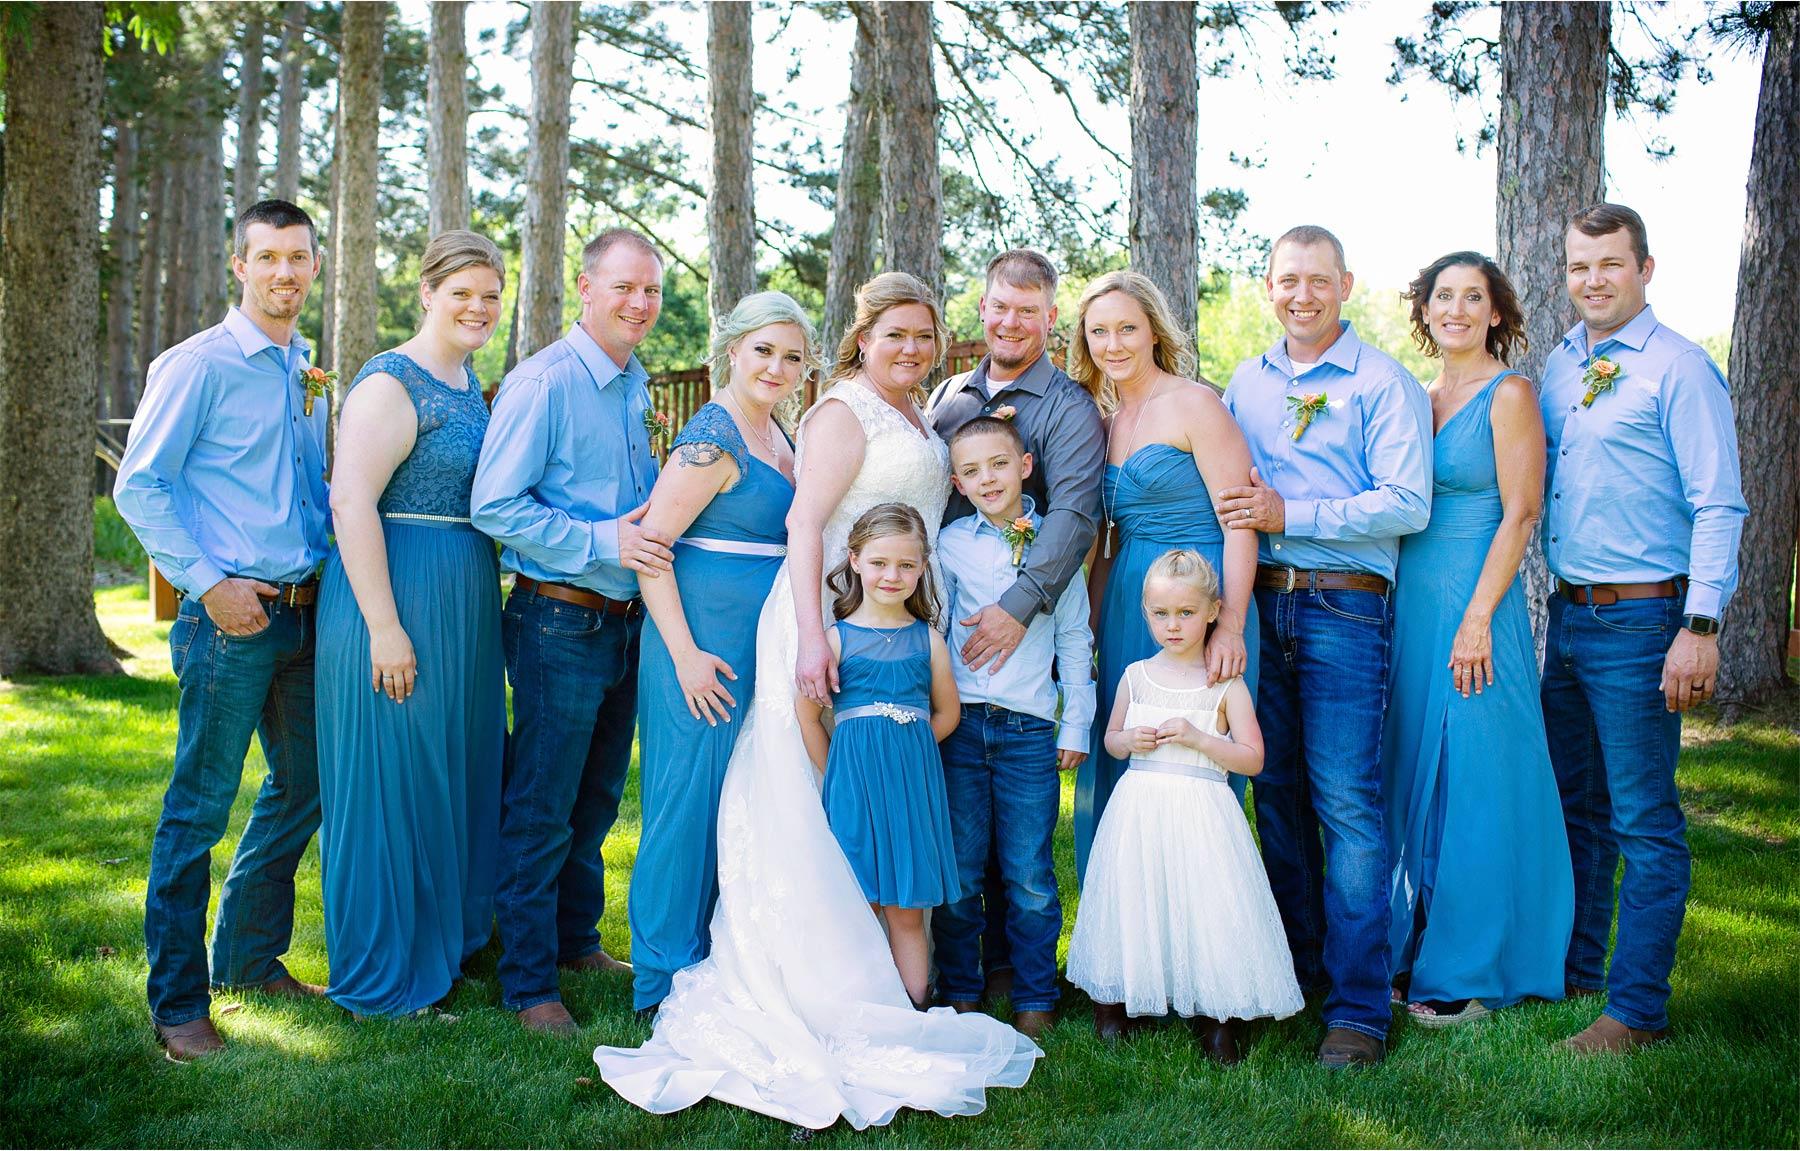 05-Vick-Photography-Wedding-Brainerd-Minnesota-Pine-Peaks-Lodge-Cabin-Rustic-Bridesmaids-Groomsmen-Kristi-and-Noel.jpg